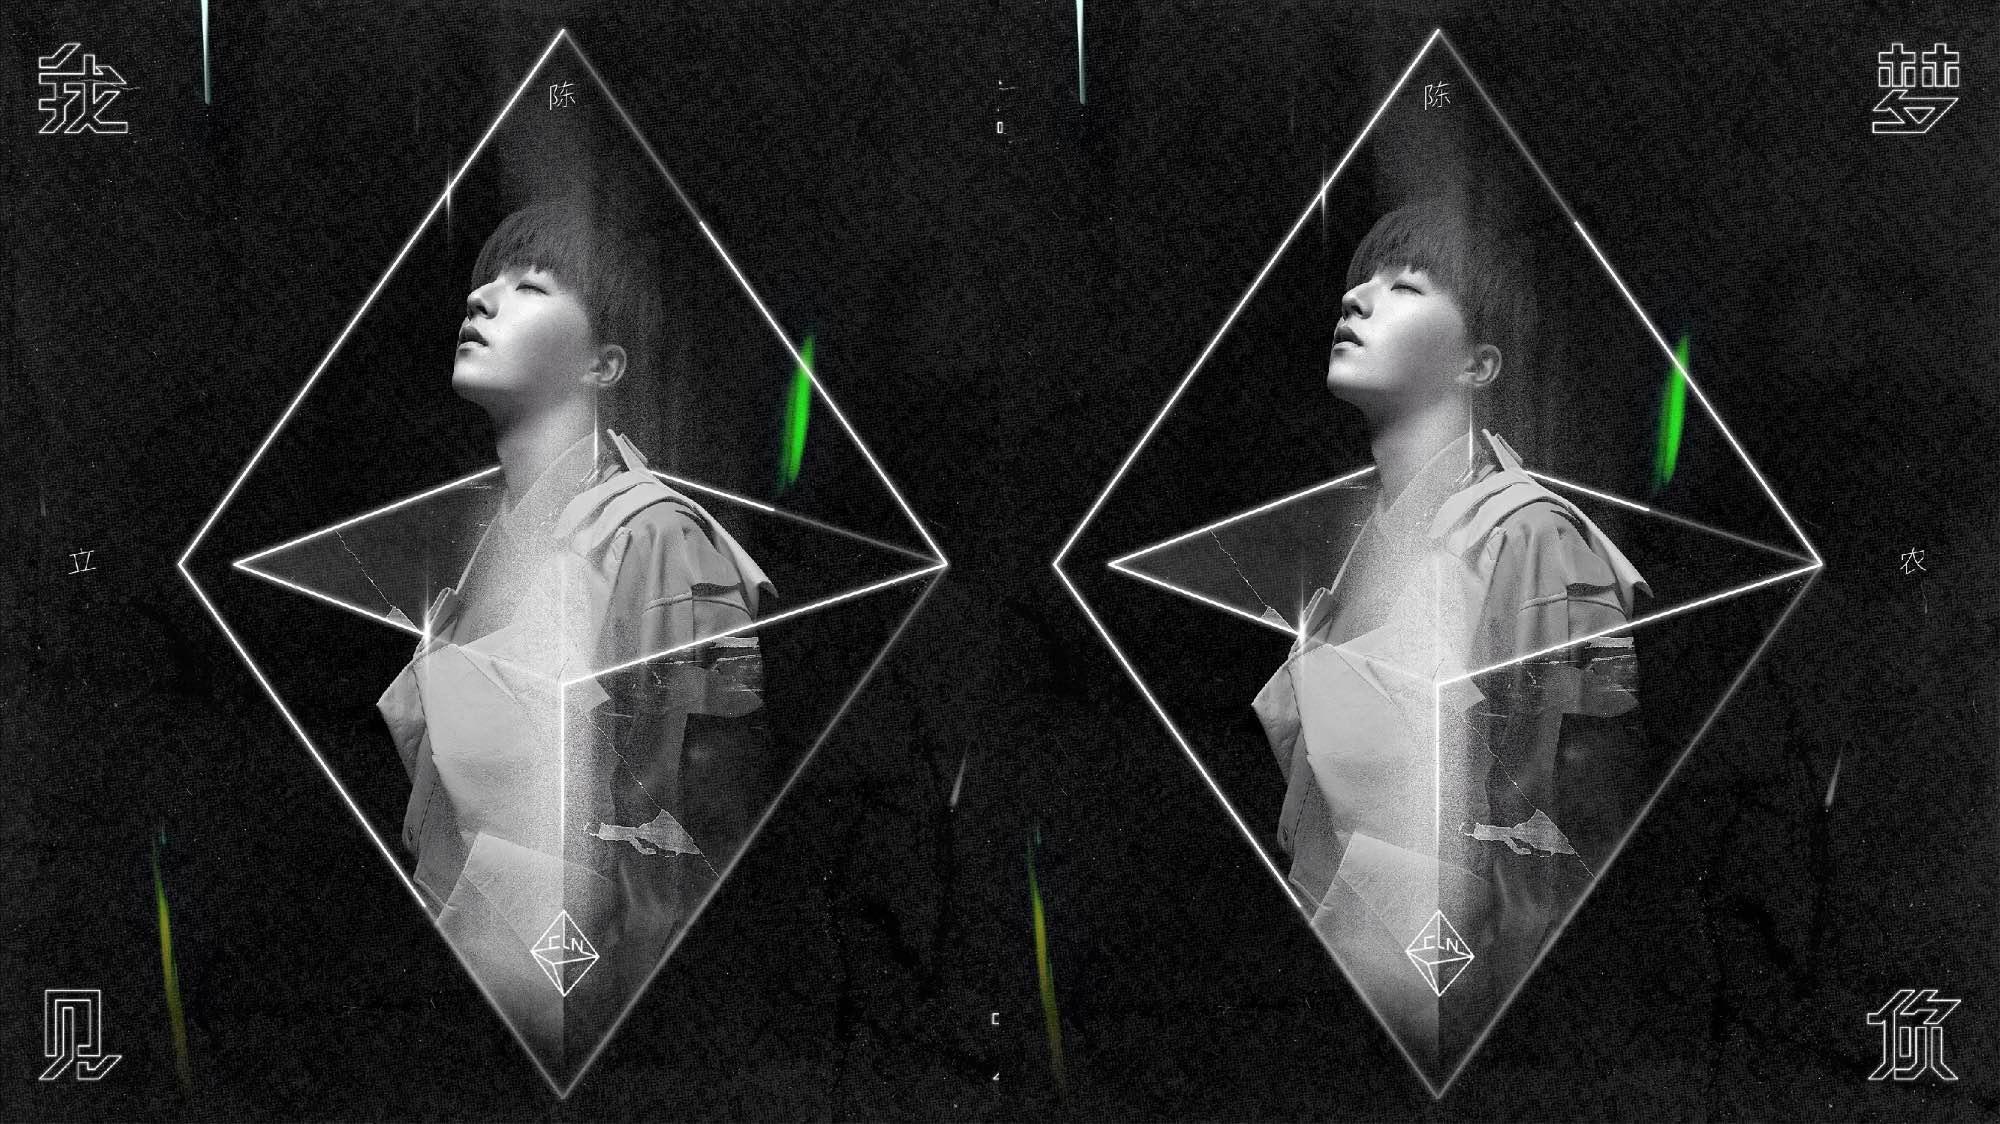 CLN Coming Soon陈立农首张个人专辑即将发行    5/14全新前导单曲百大电台首播